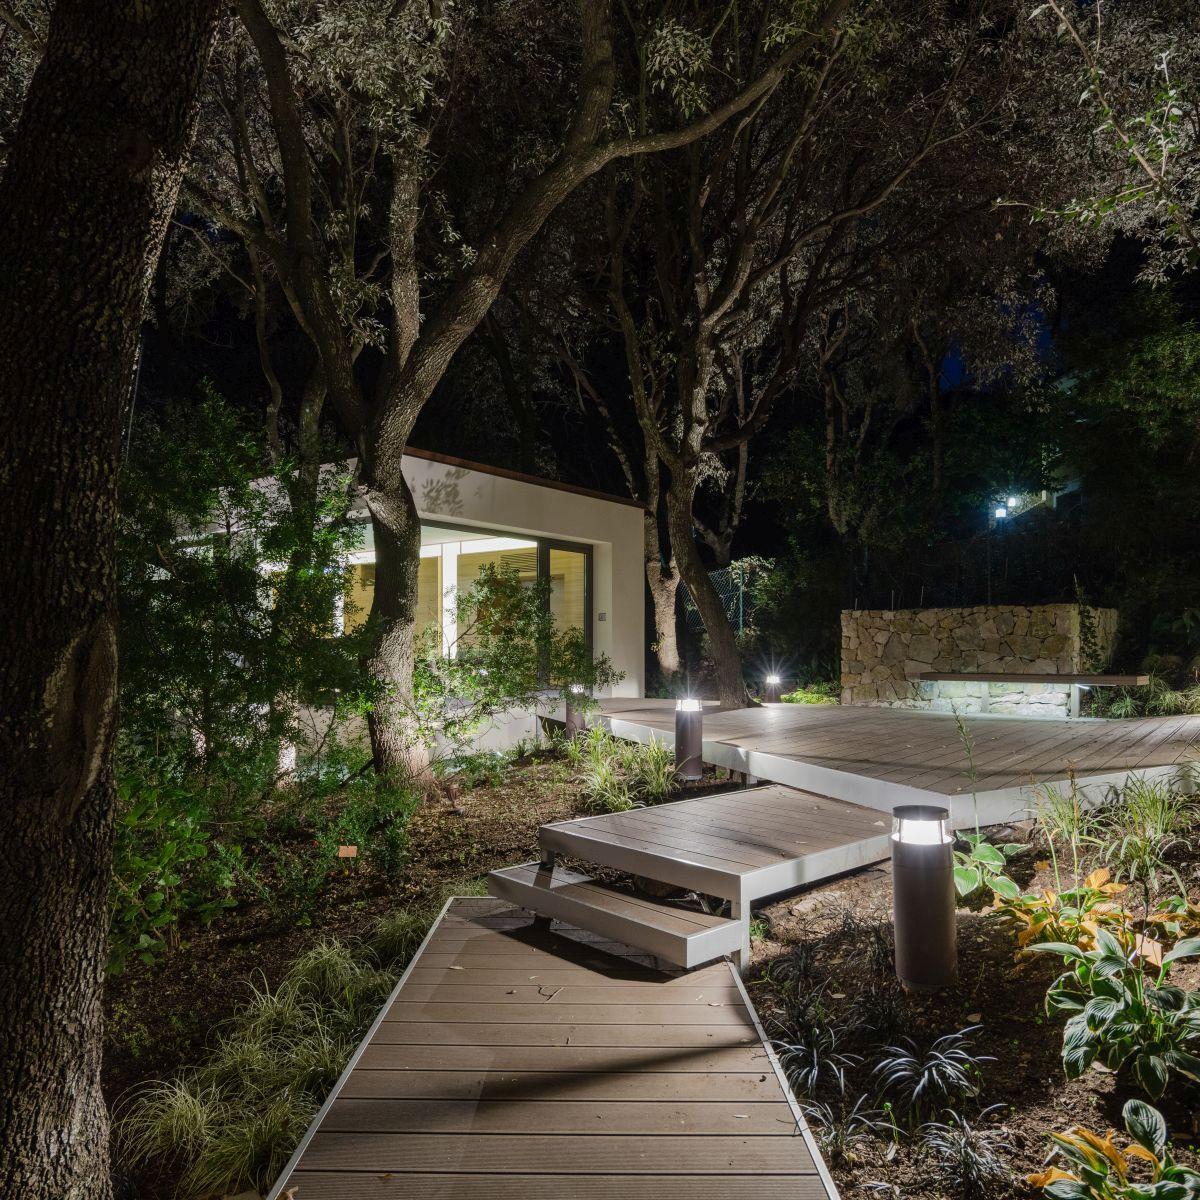 Casa nel Bosco walkway at night